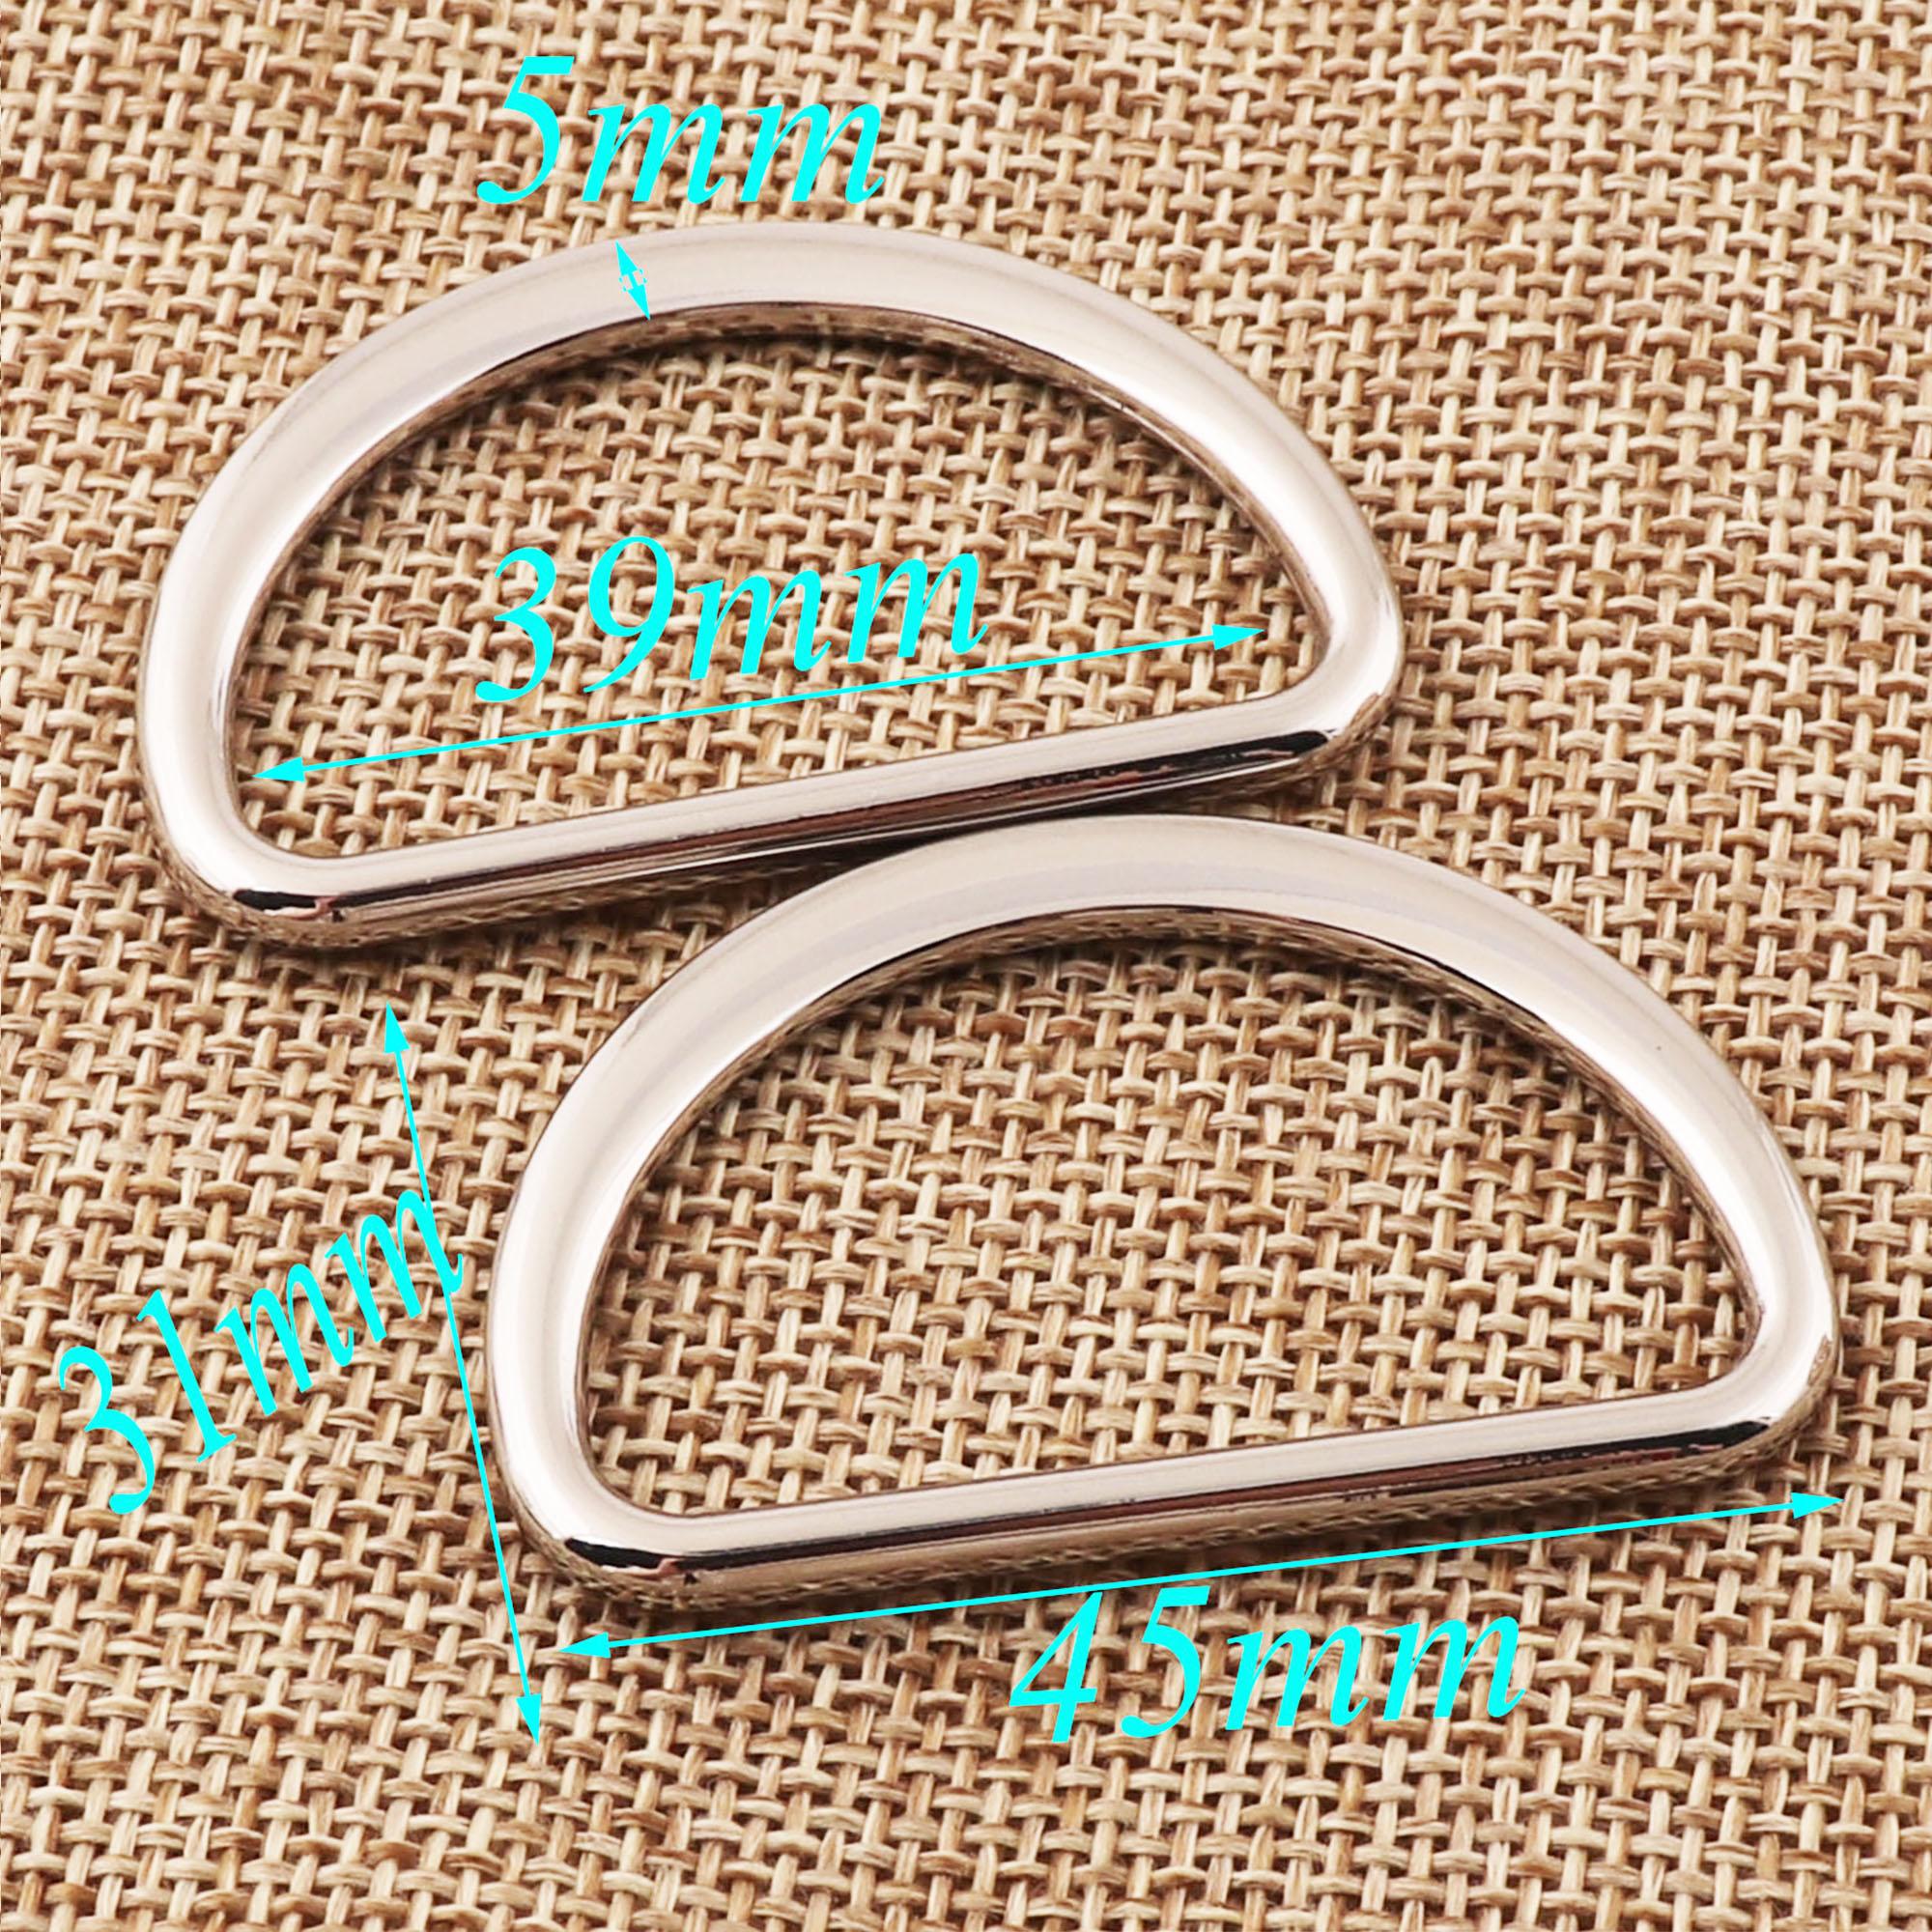 10 PCS Silver D Ring Buckles,D Rings d ring belt,Webbing Purse Bag Handbag purse Hardware,metal d-ring Purse Ring-27mm 42